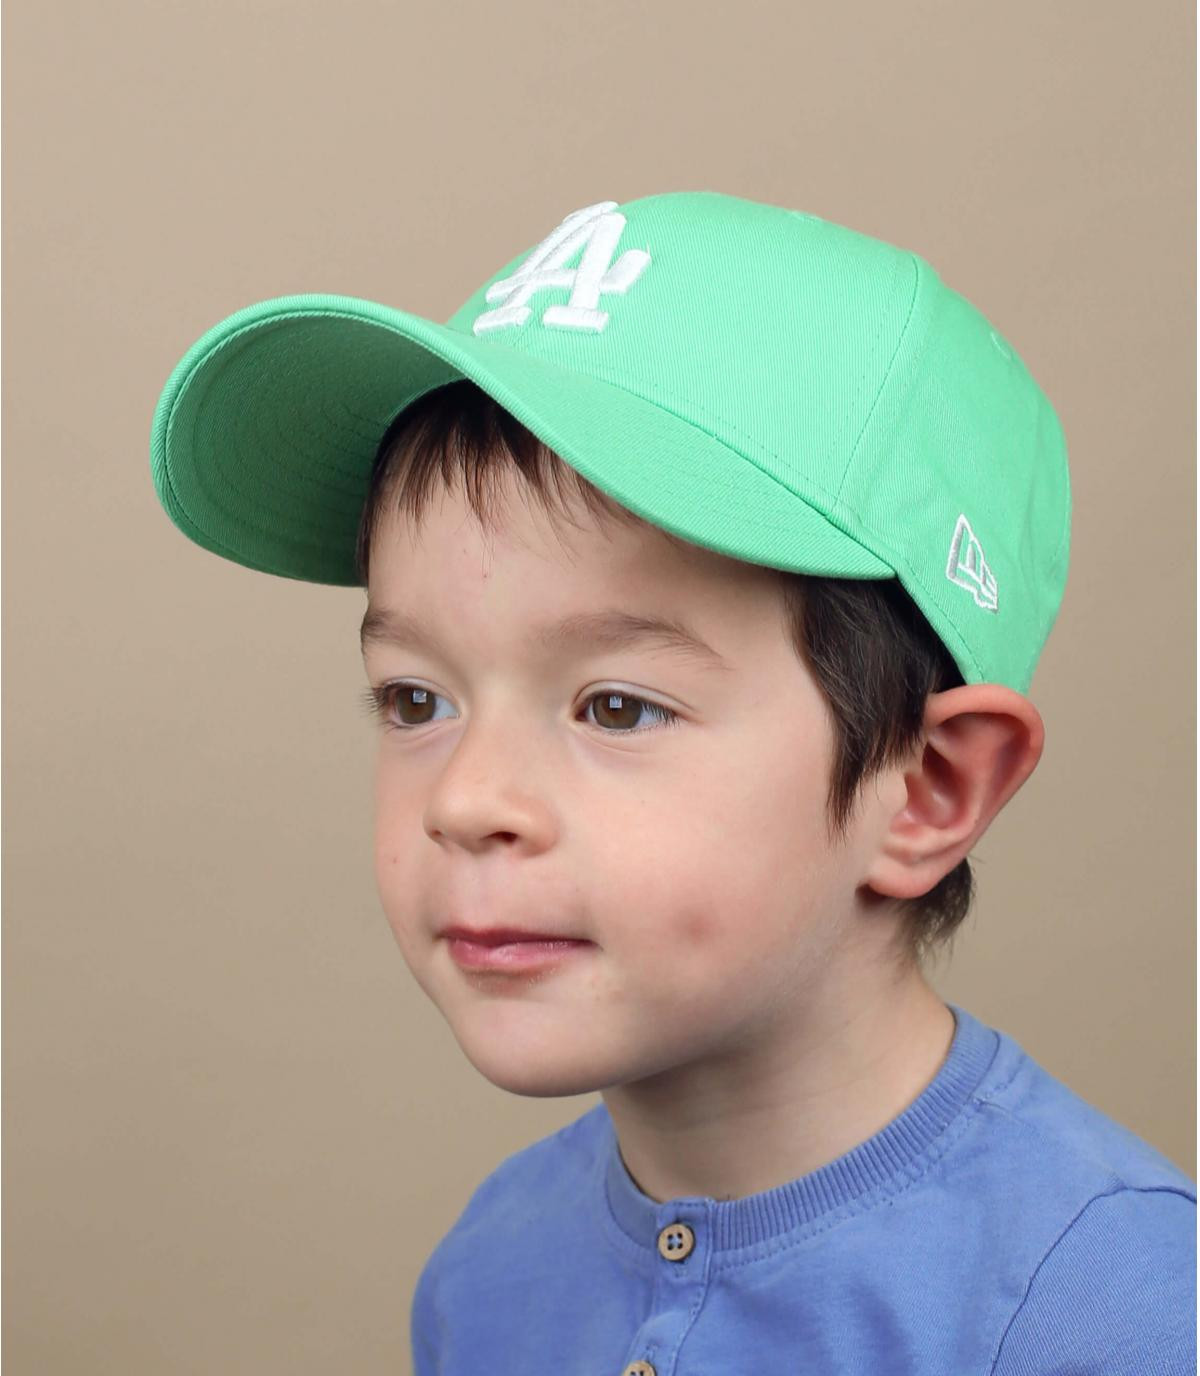 gorra infantil LA azul verde